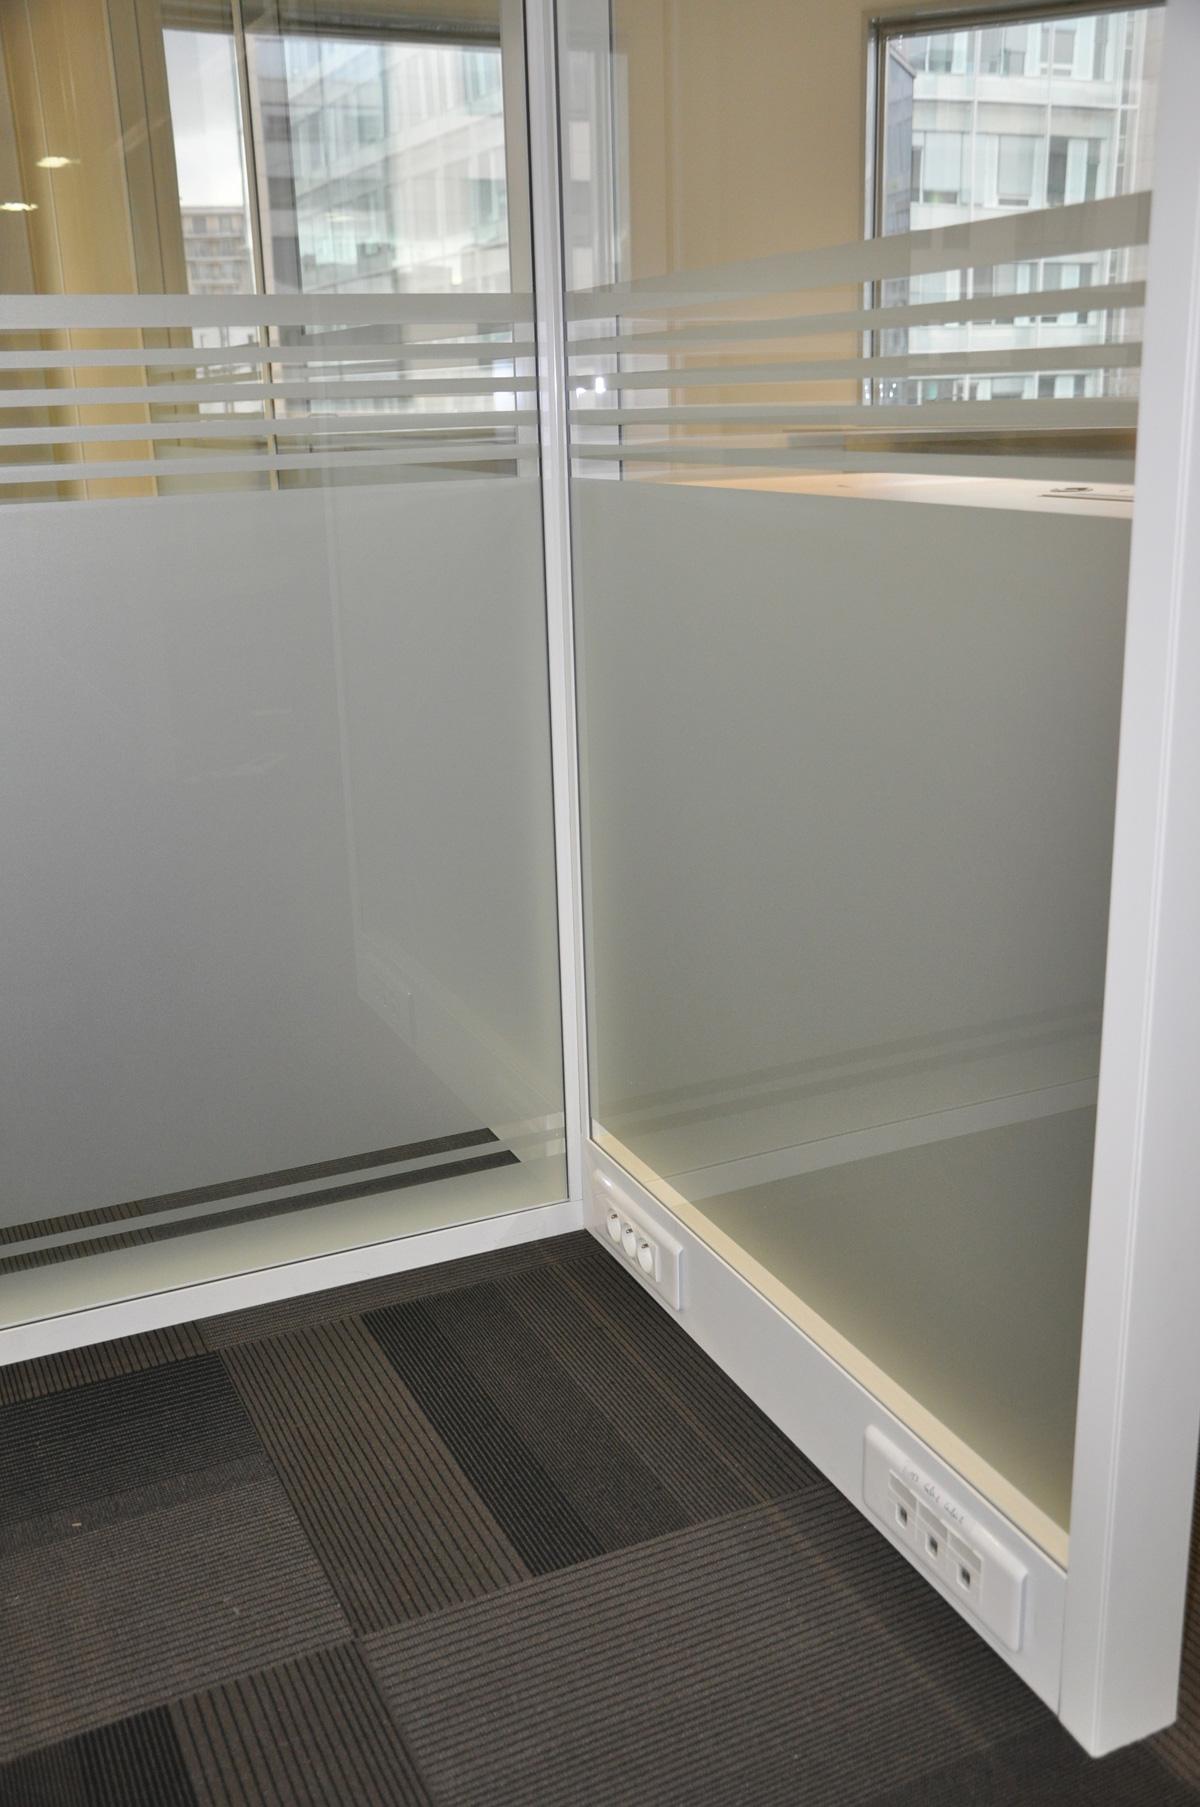 cloison amovible avec couvre joint. Black Bedroom Furniture Sets. Home Design Ideas